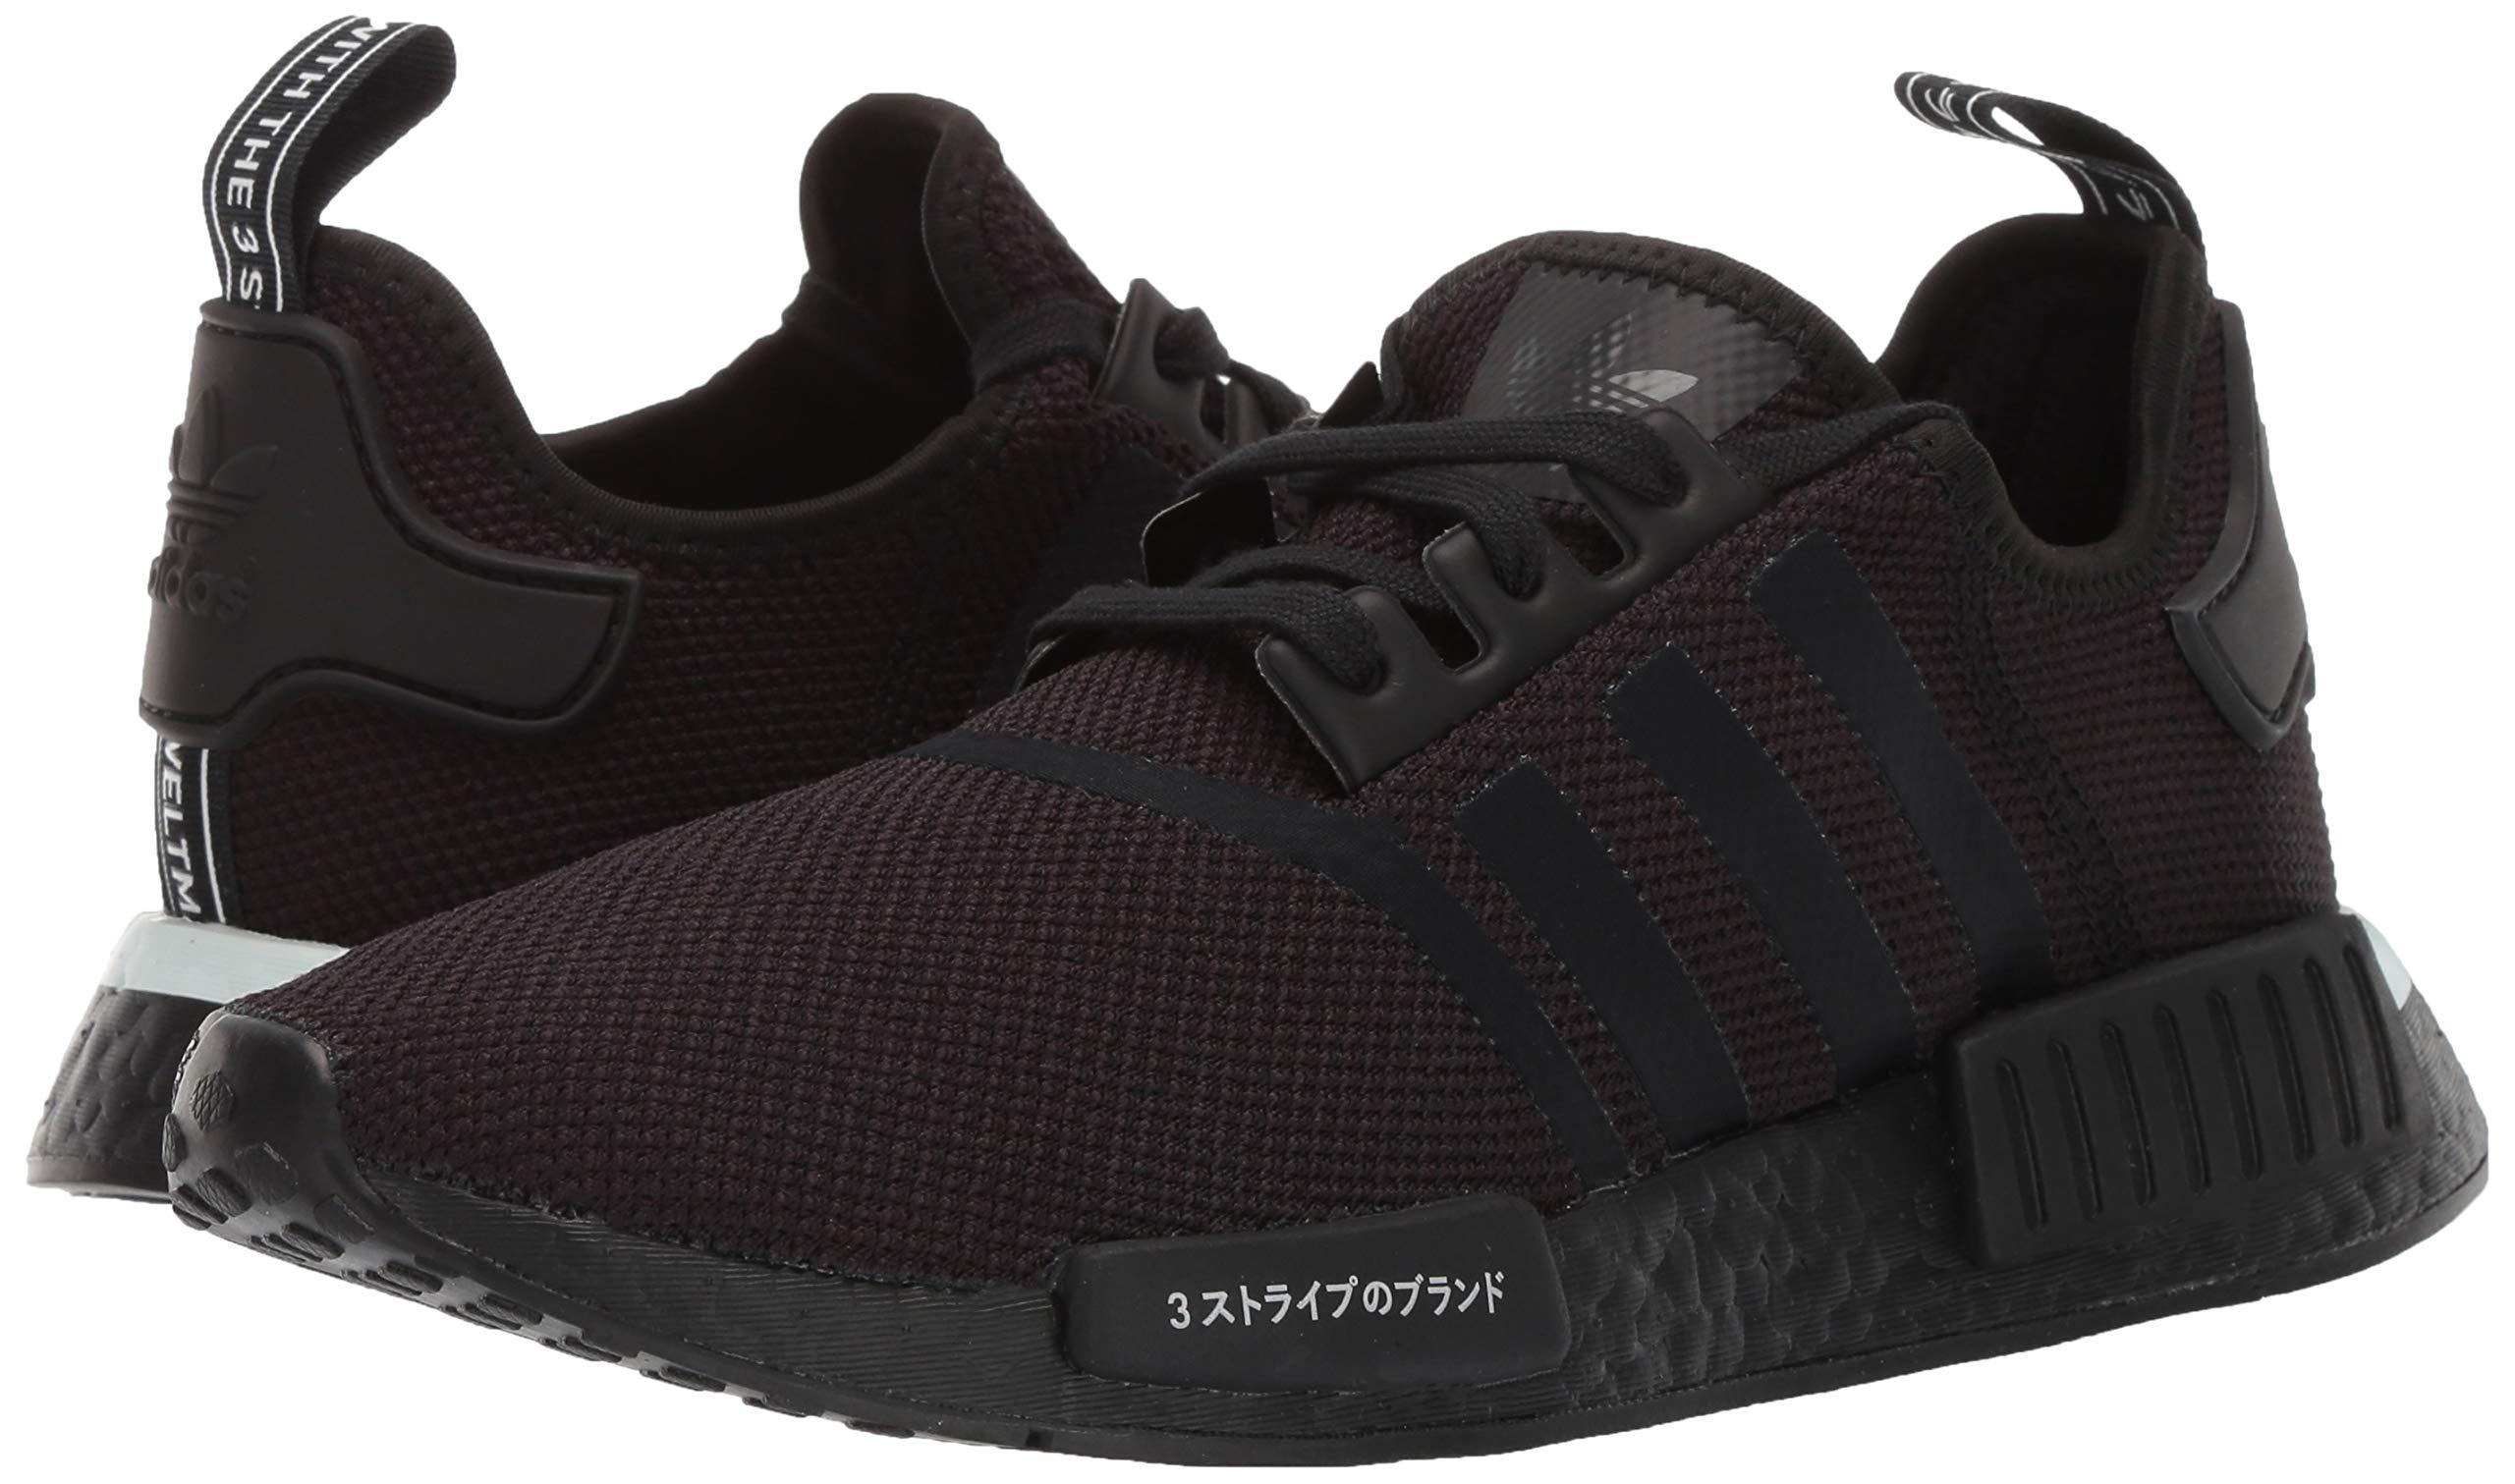 adidas Originals Men's NMD_R1 Running Shoe, Black/White, 4 M US by adidas Originals (Image #6)